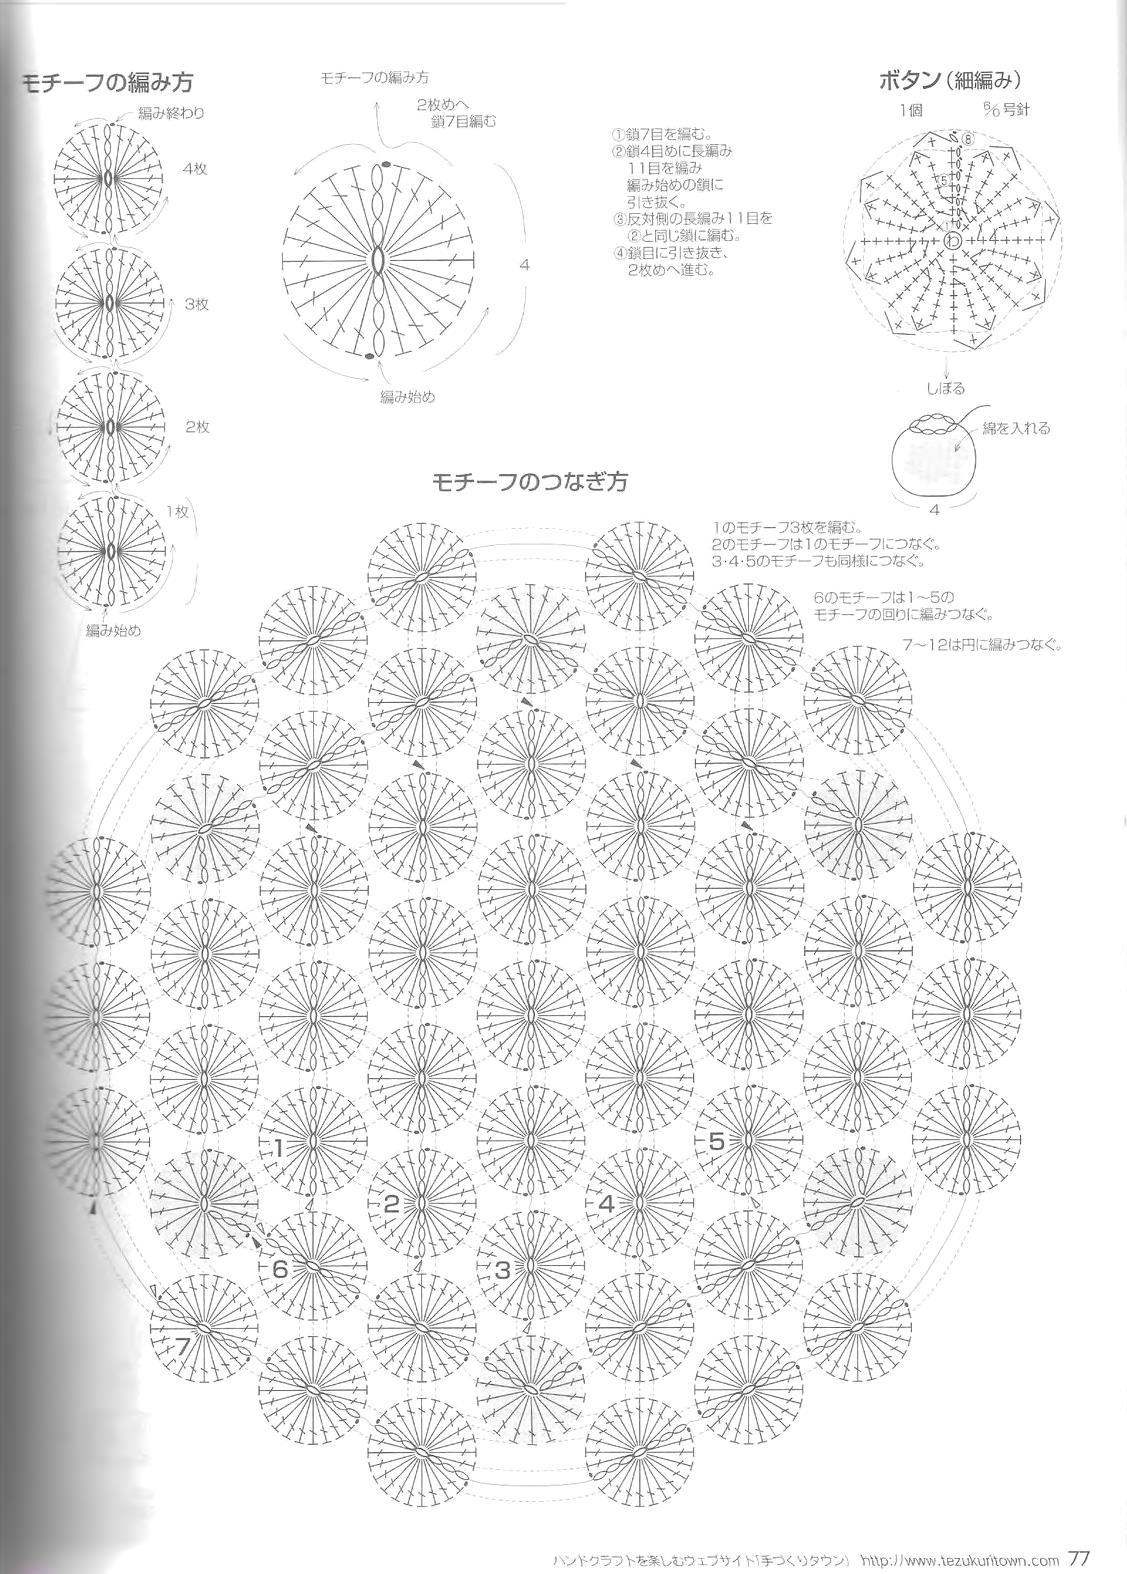 Let's knit series NV4375 2008 M-L sp-kr_77